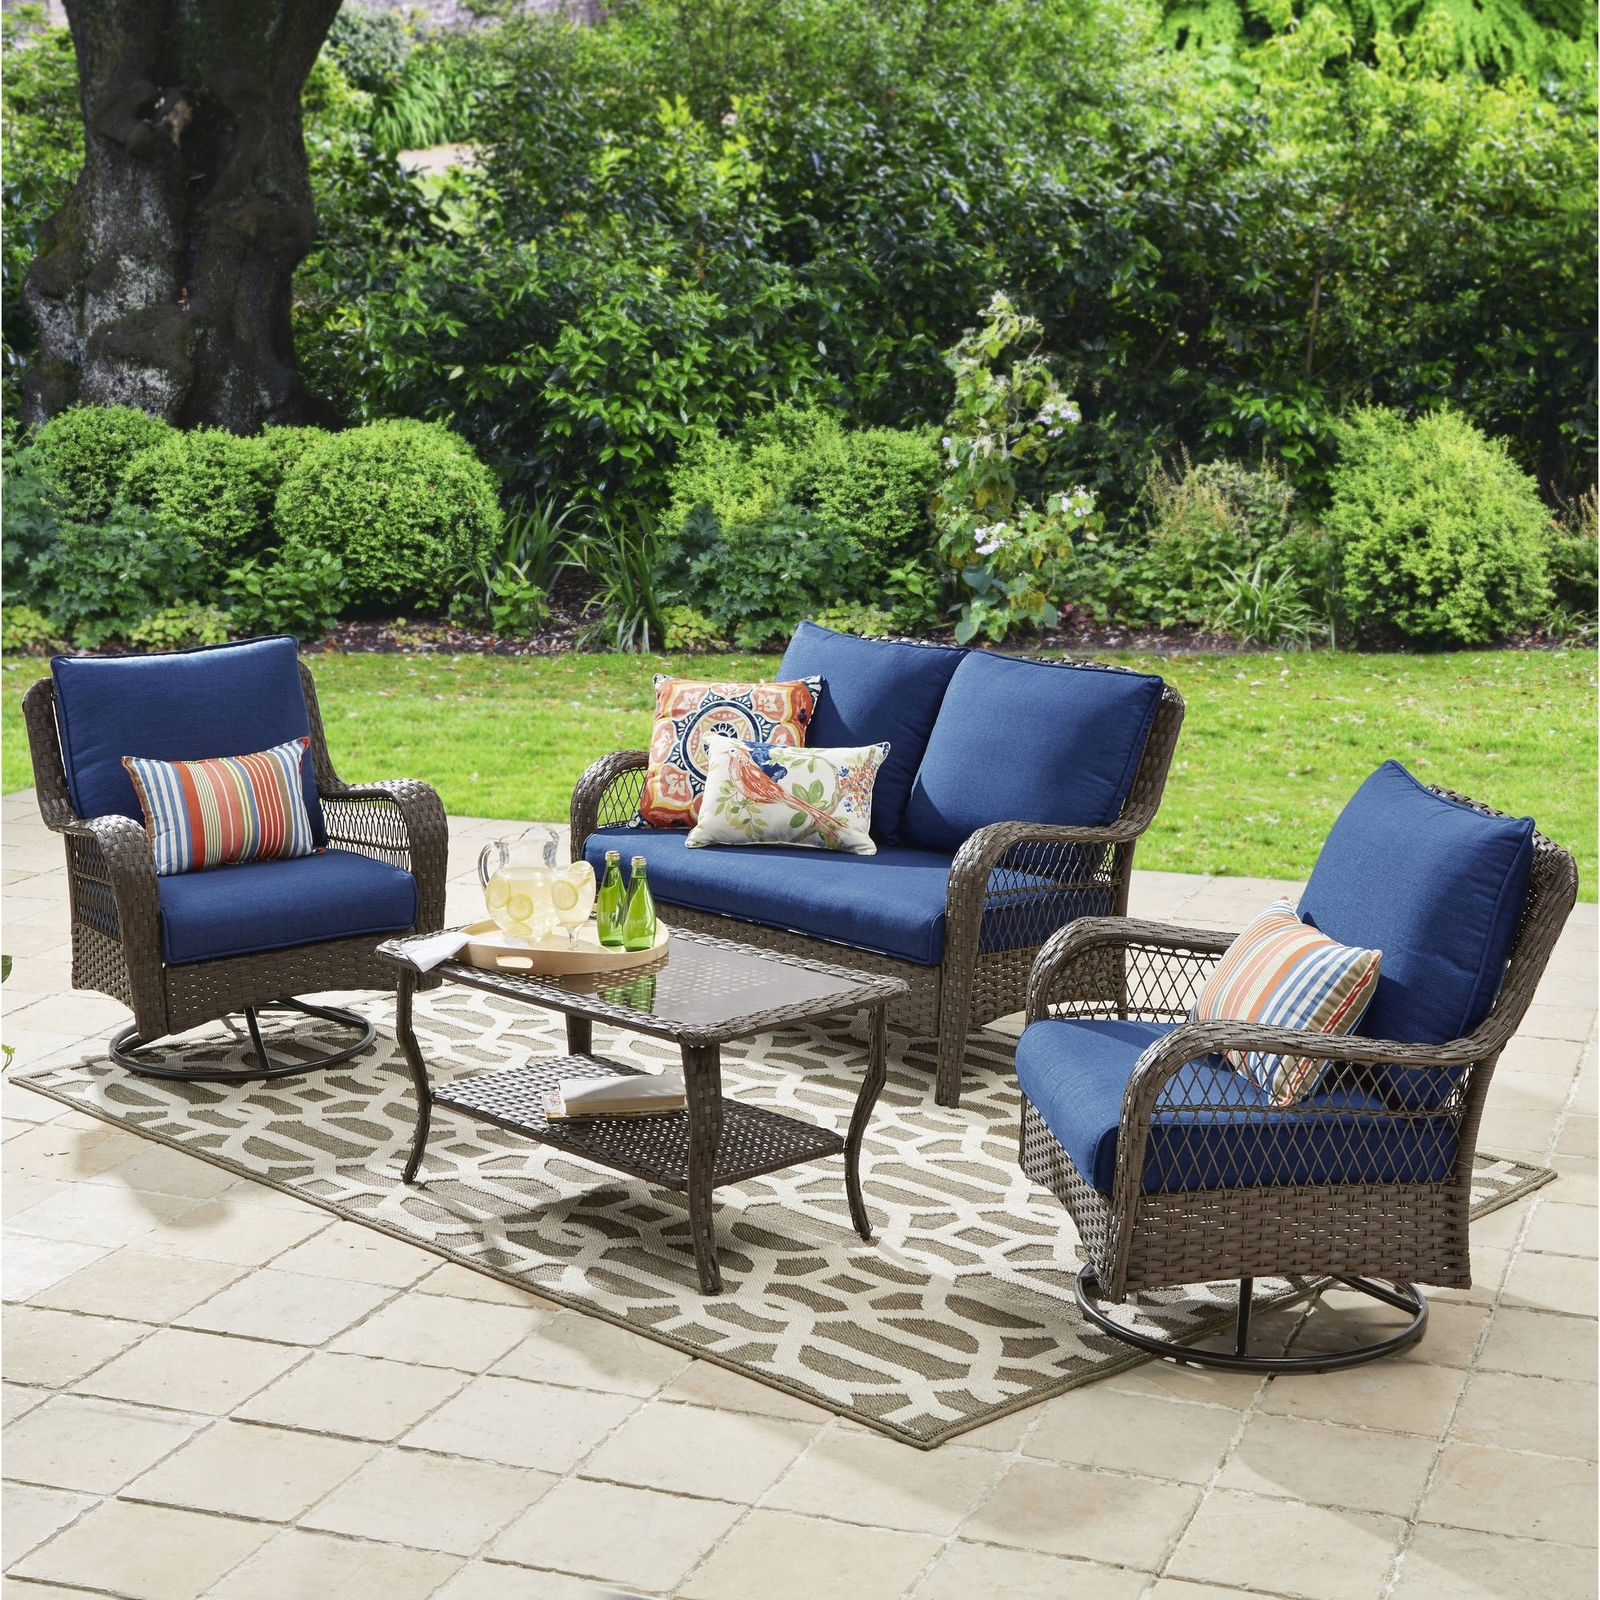 Popular Ebay Patio Conversation Sets In Colebrook 4 Piece Outdoor Patio Conversation Set Seats 4 Deck (View 14 of 15)